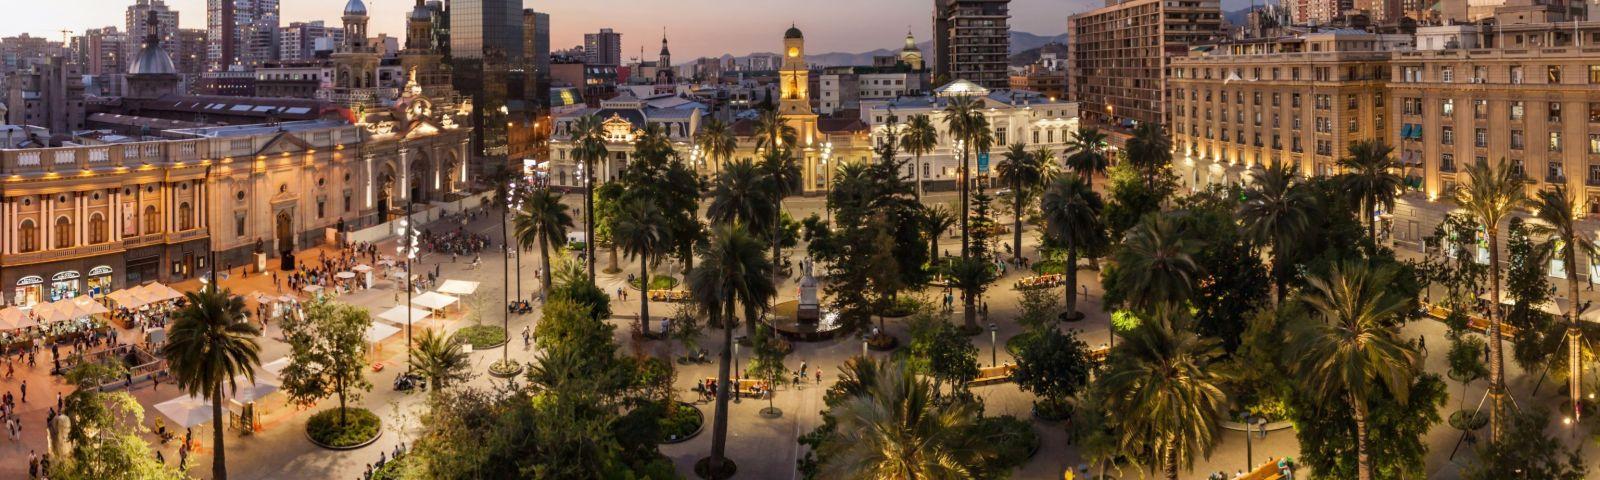 Santiago De Chile Sehenswürdigkeiten Enchanting Travels